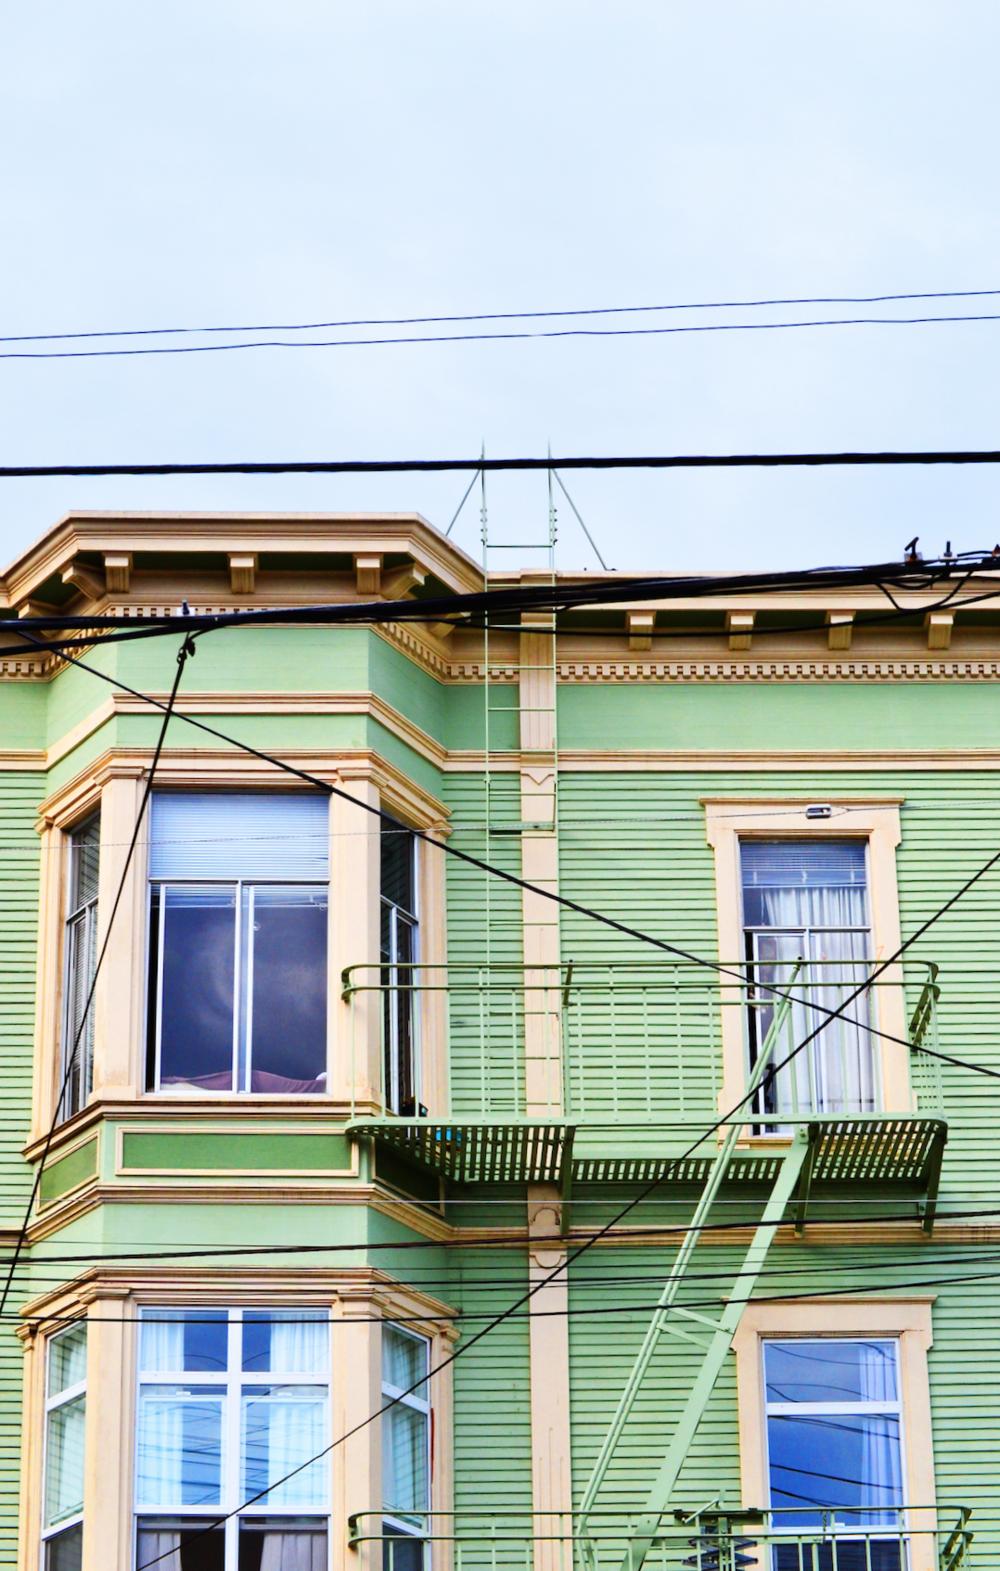 Aliana+Grace+Bailey+San+Francisco+California+Houses+2.png